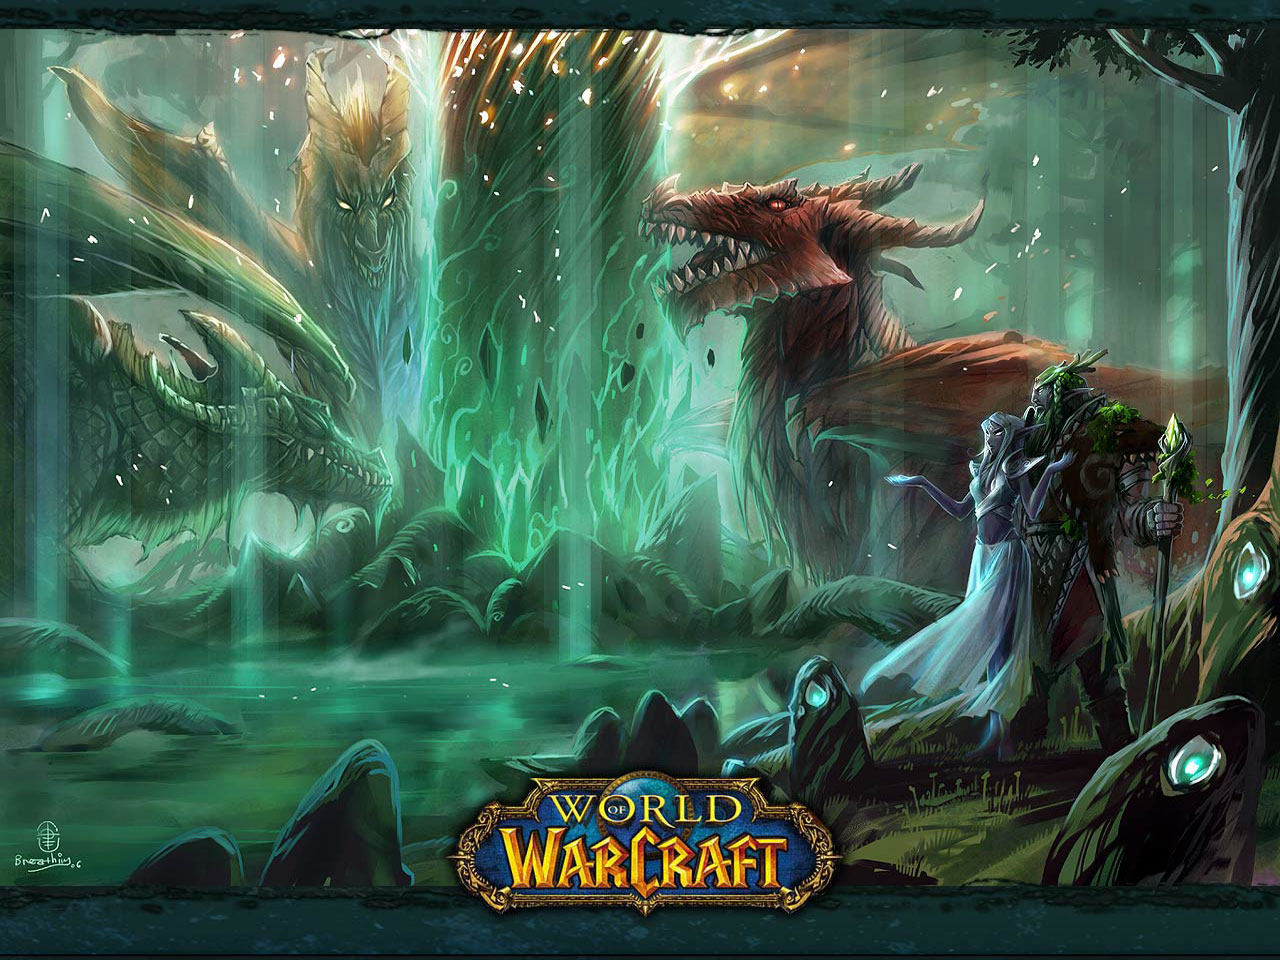 Warcraft Backgrounds